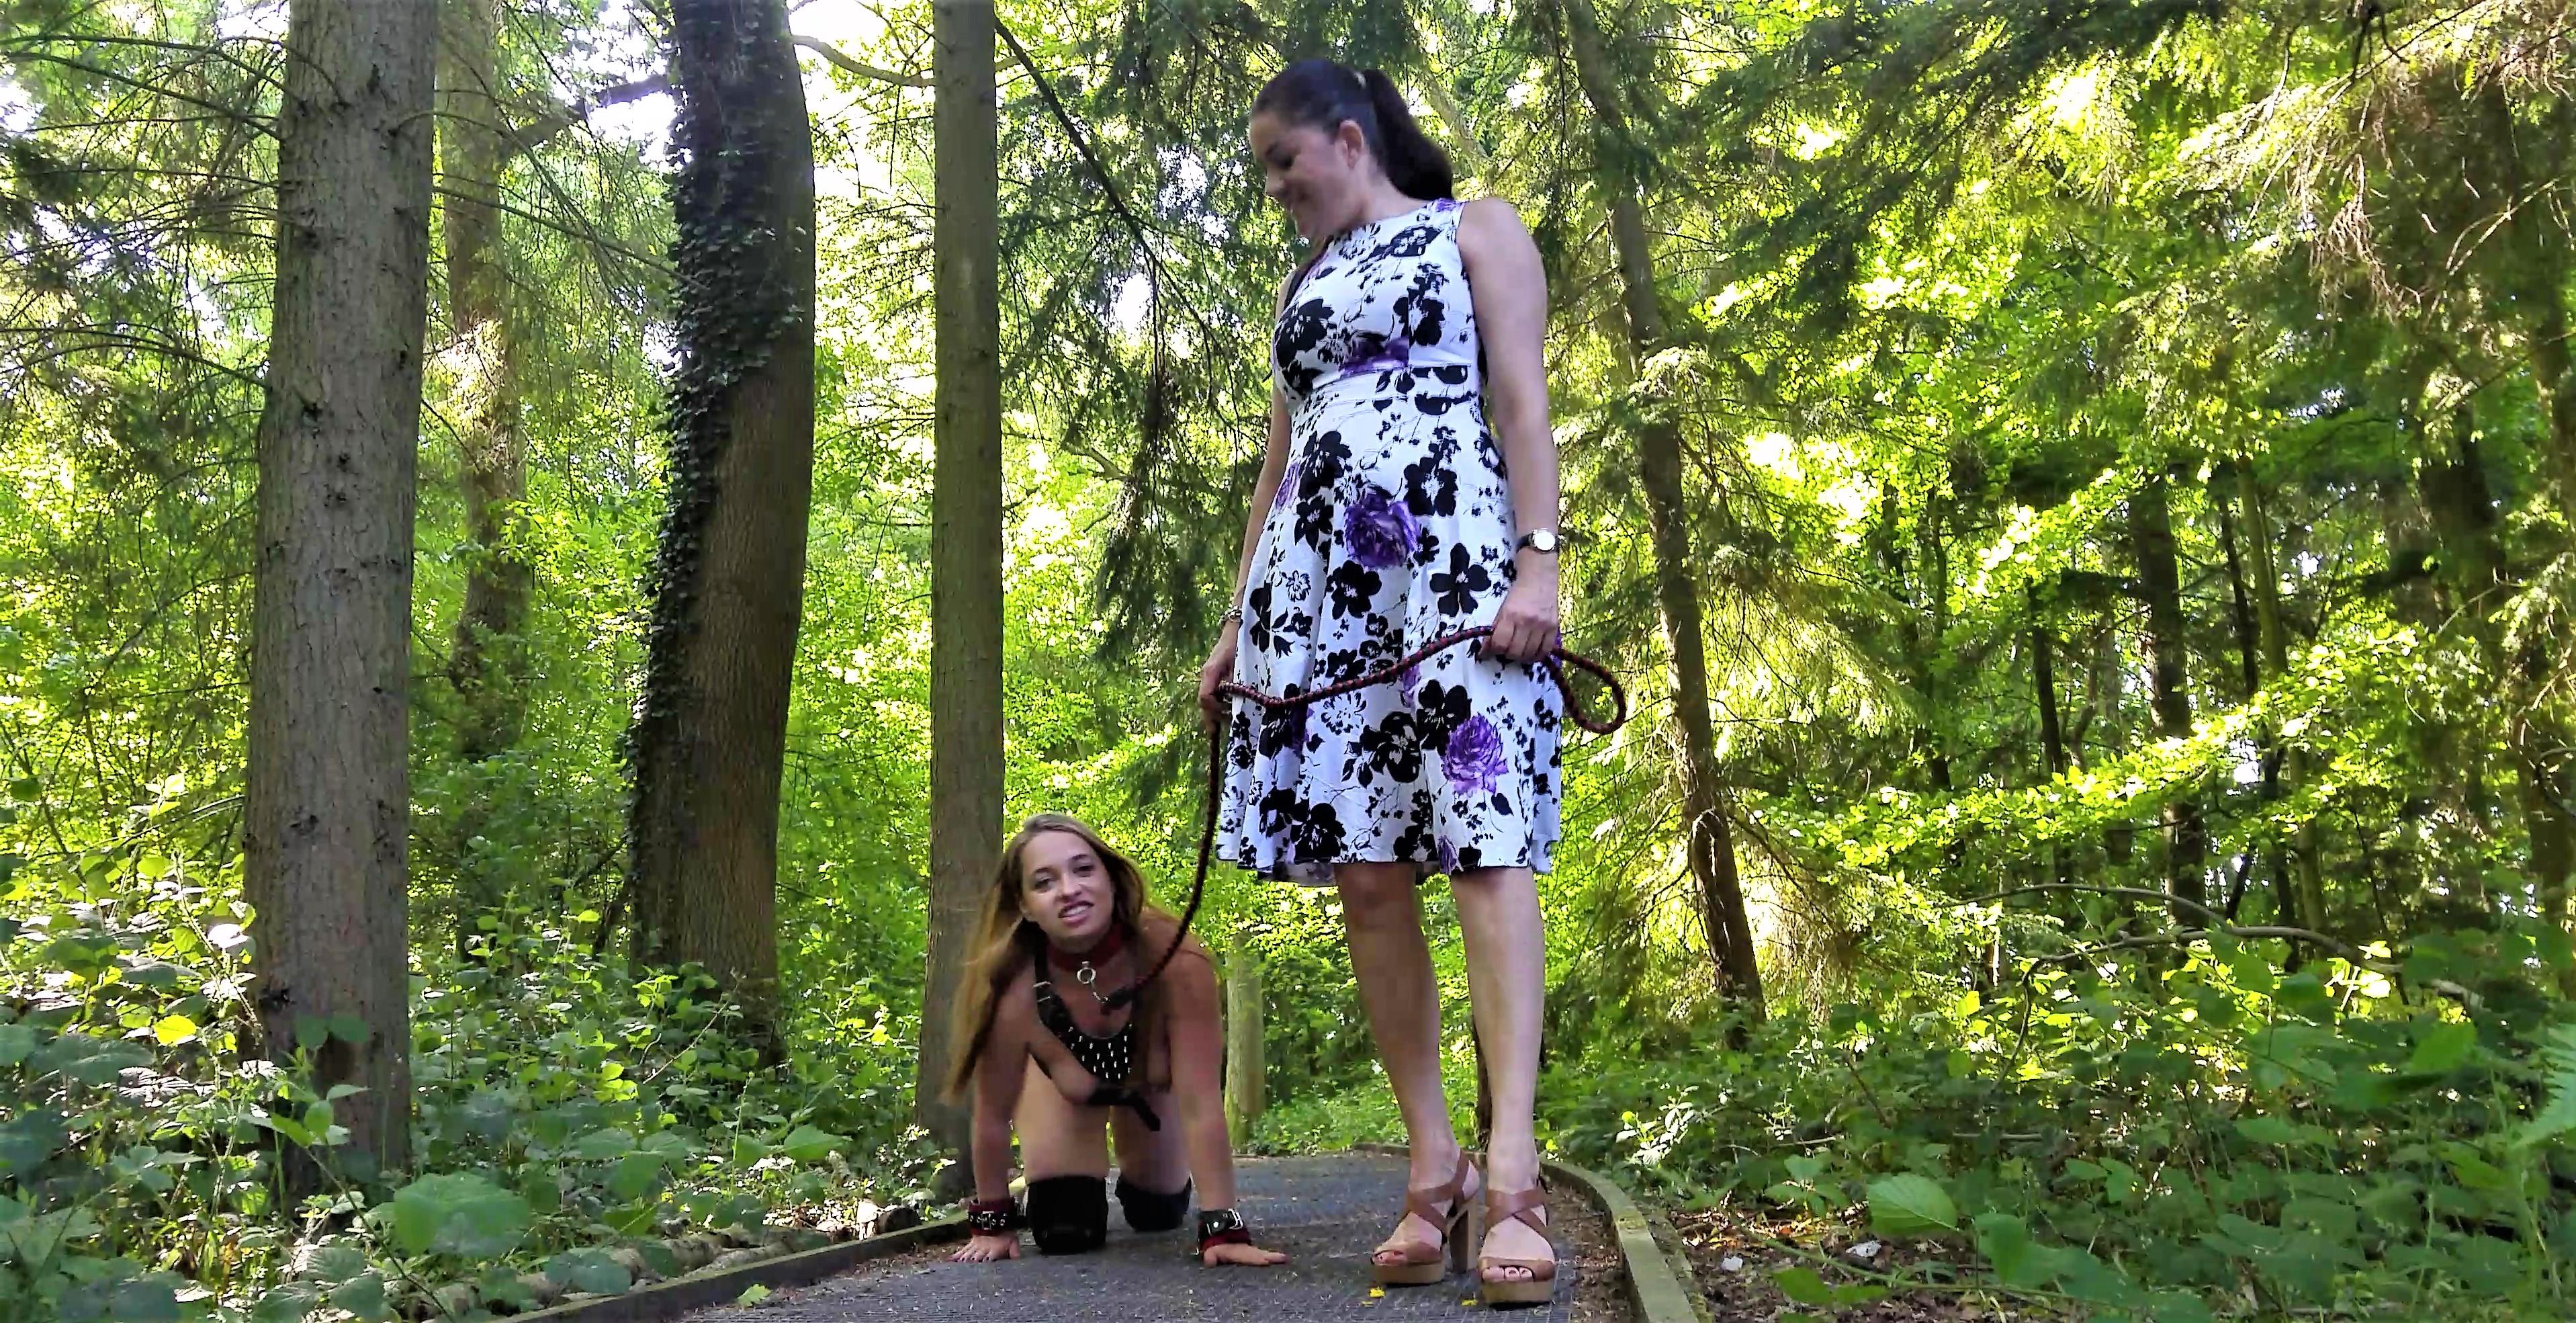 Terry Olga & Leia the dogs 26may17 Hemel_136